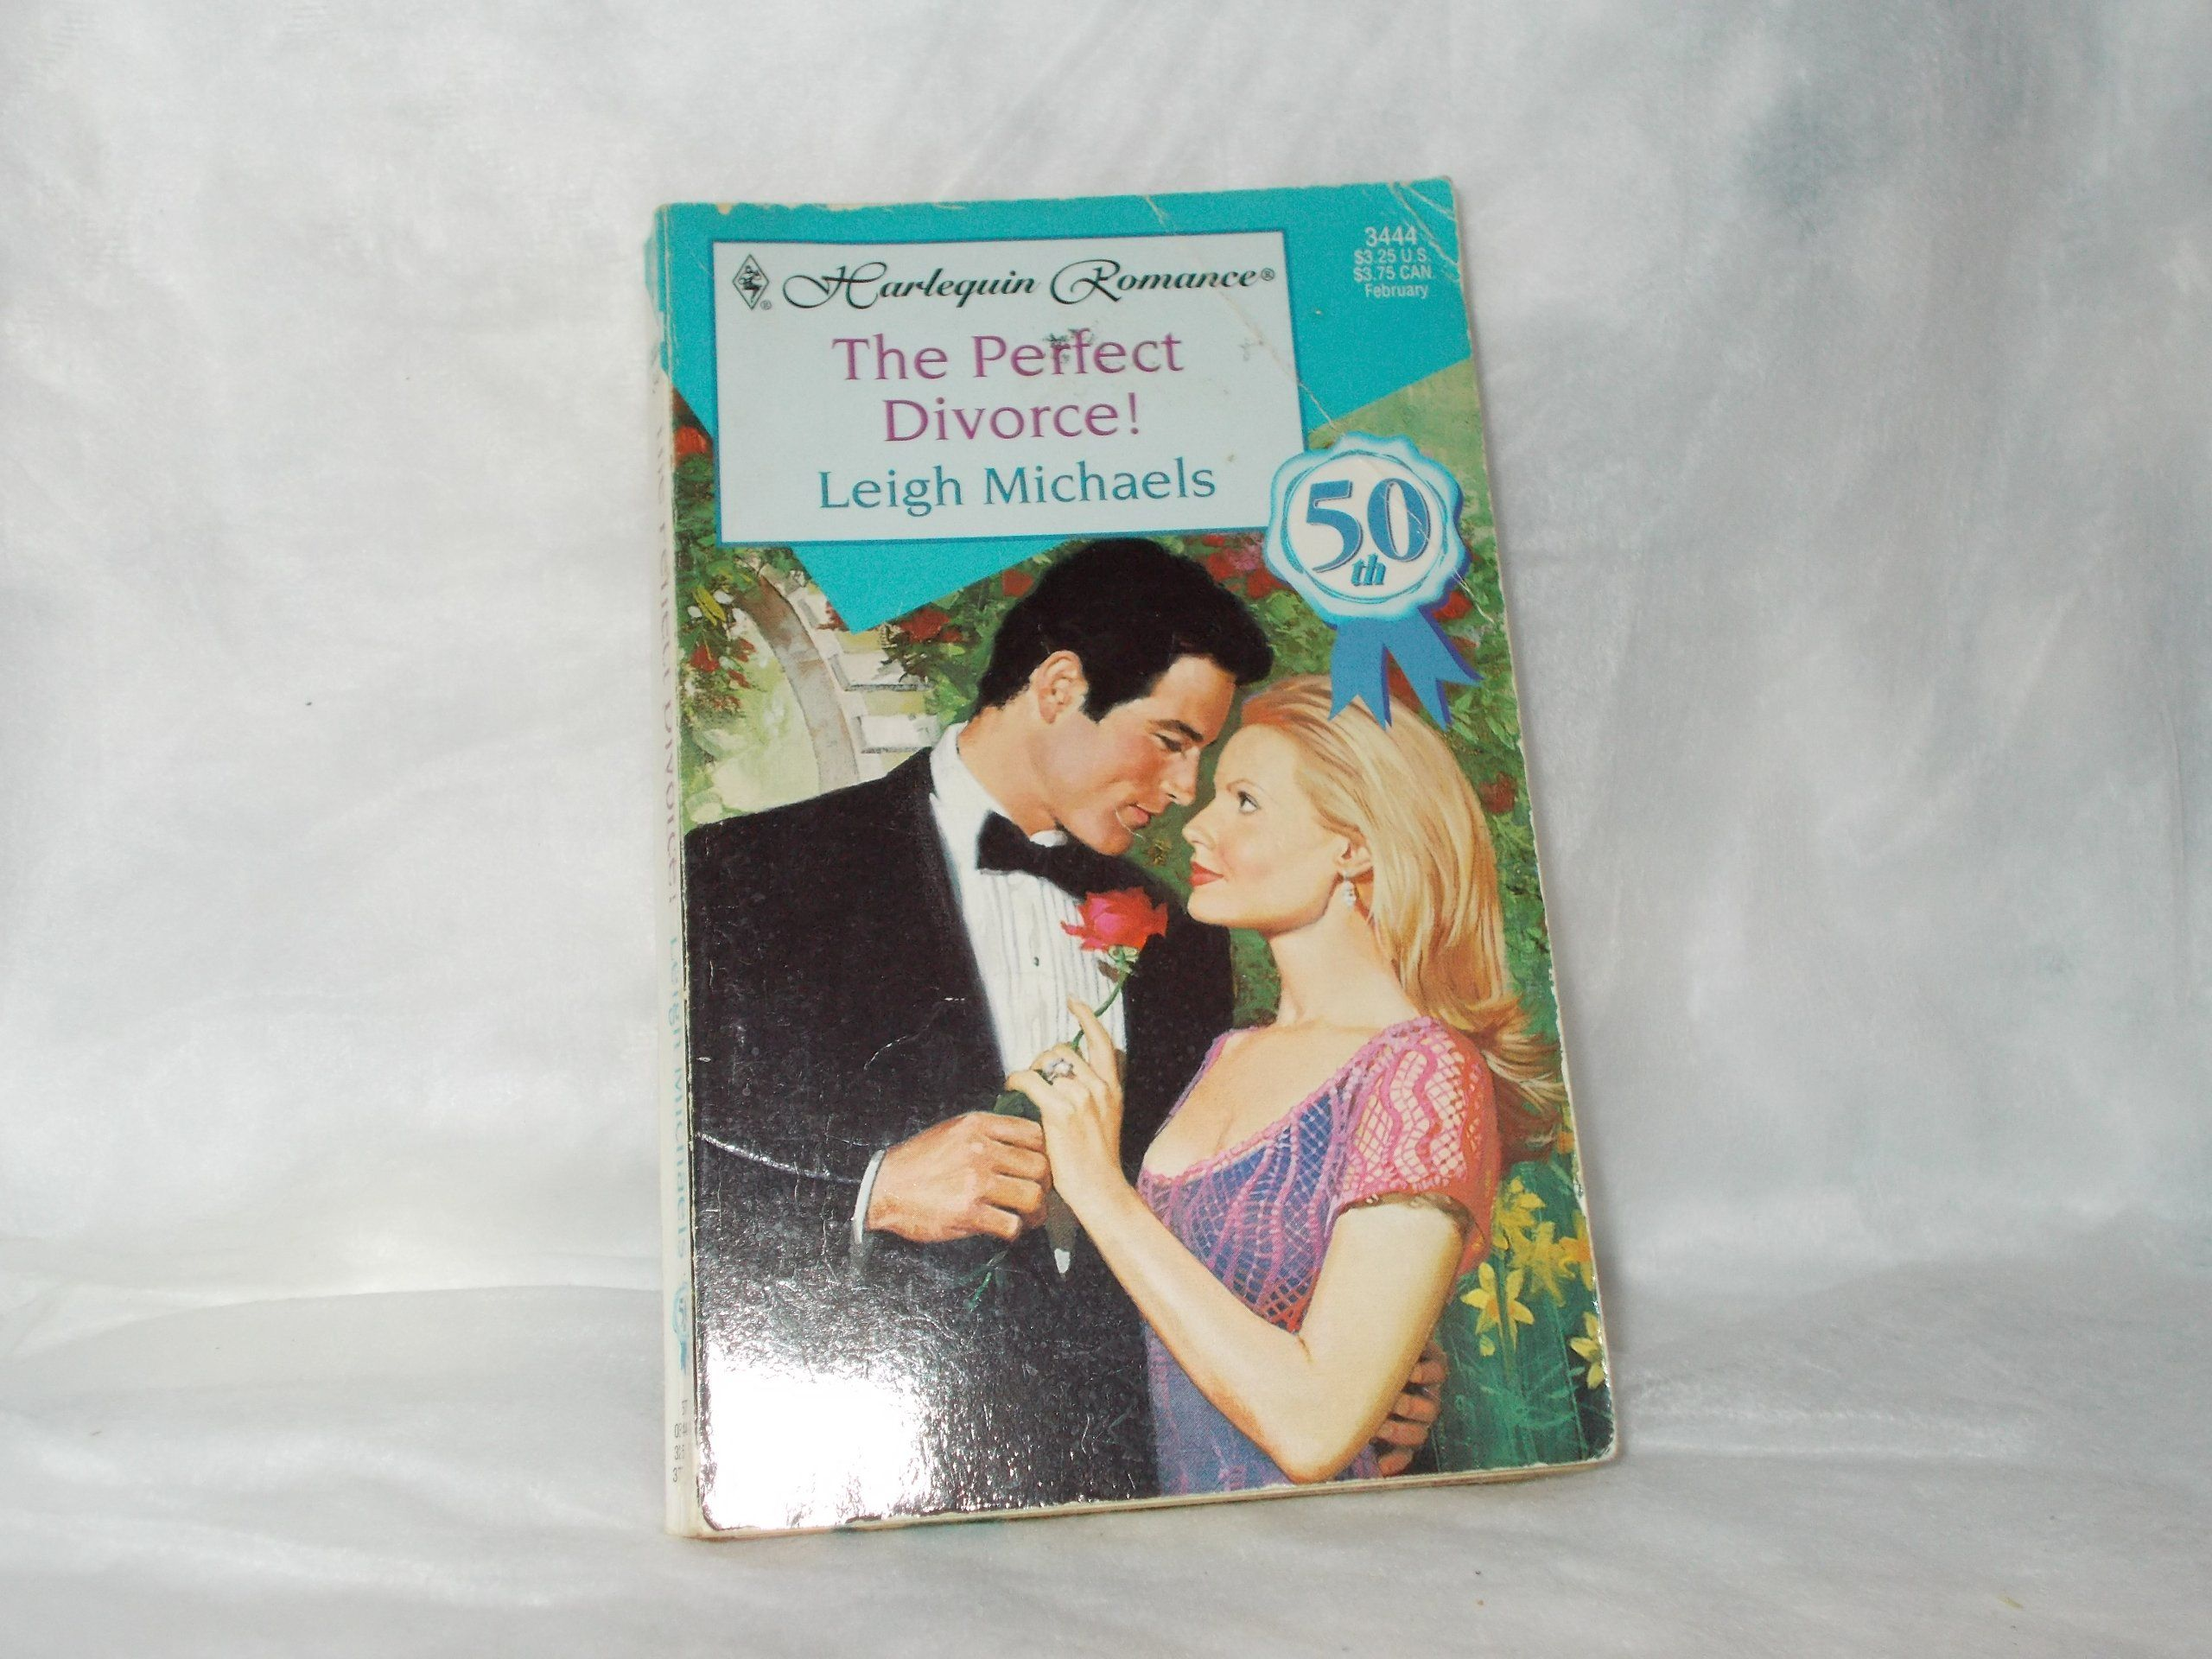 The Perfect Divorce! (Harlequin Romance) Amazon.co.uk